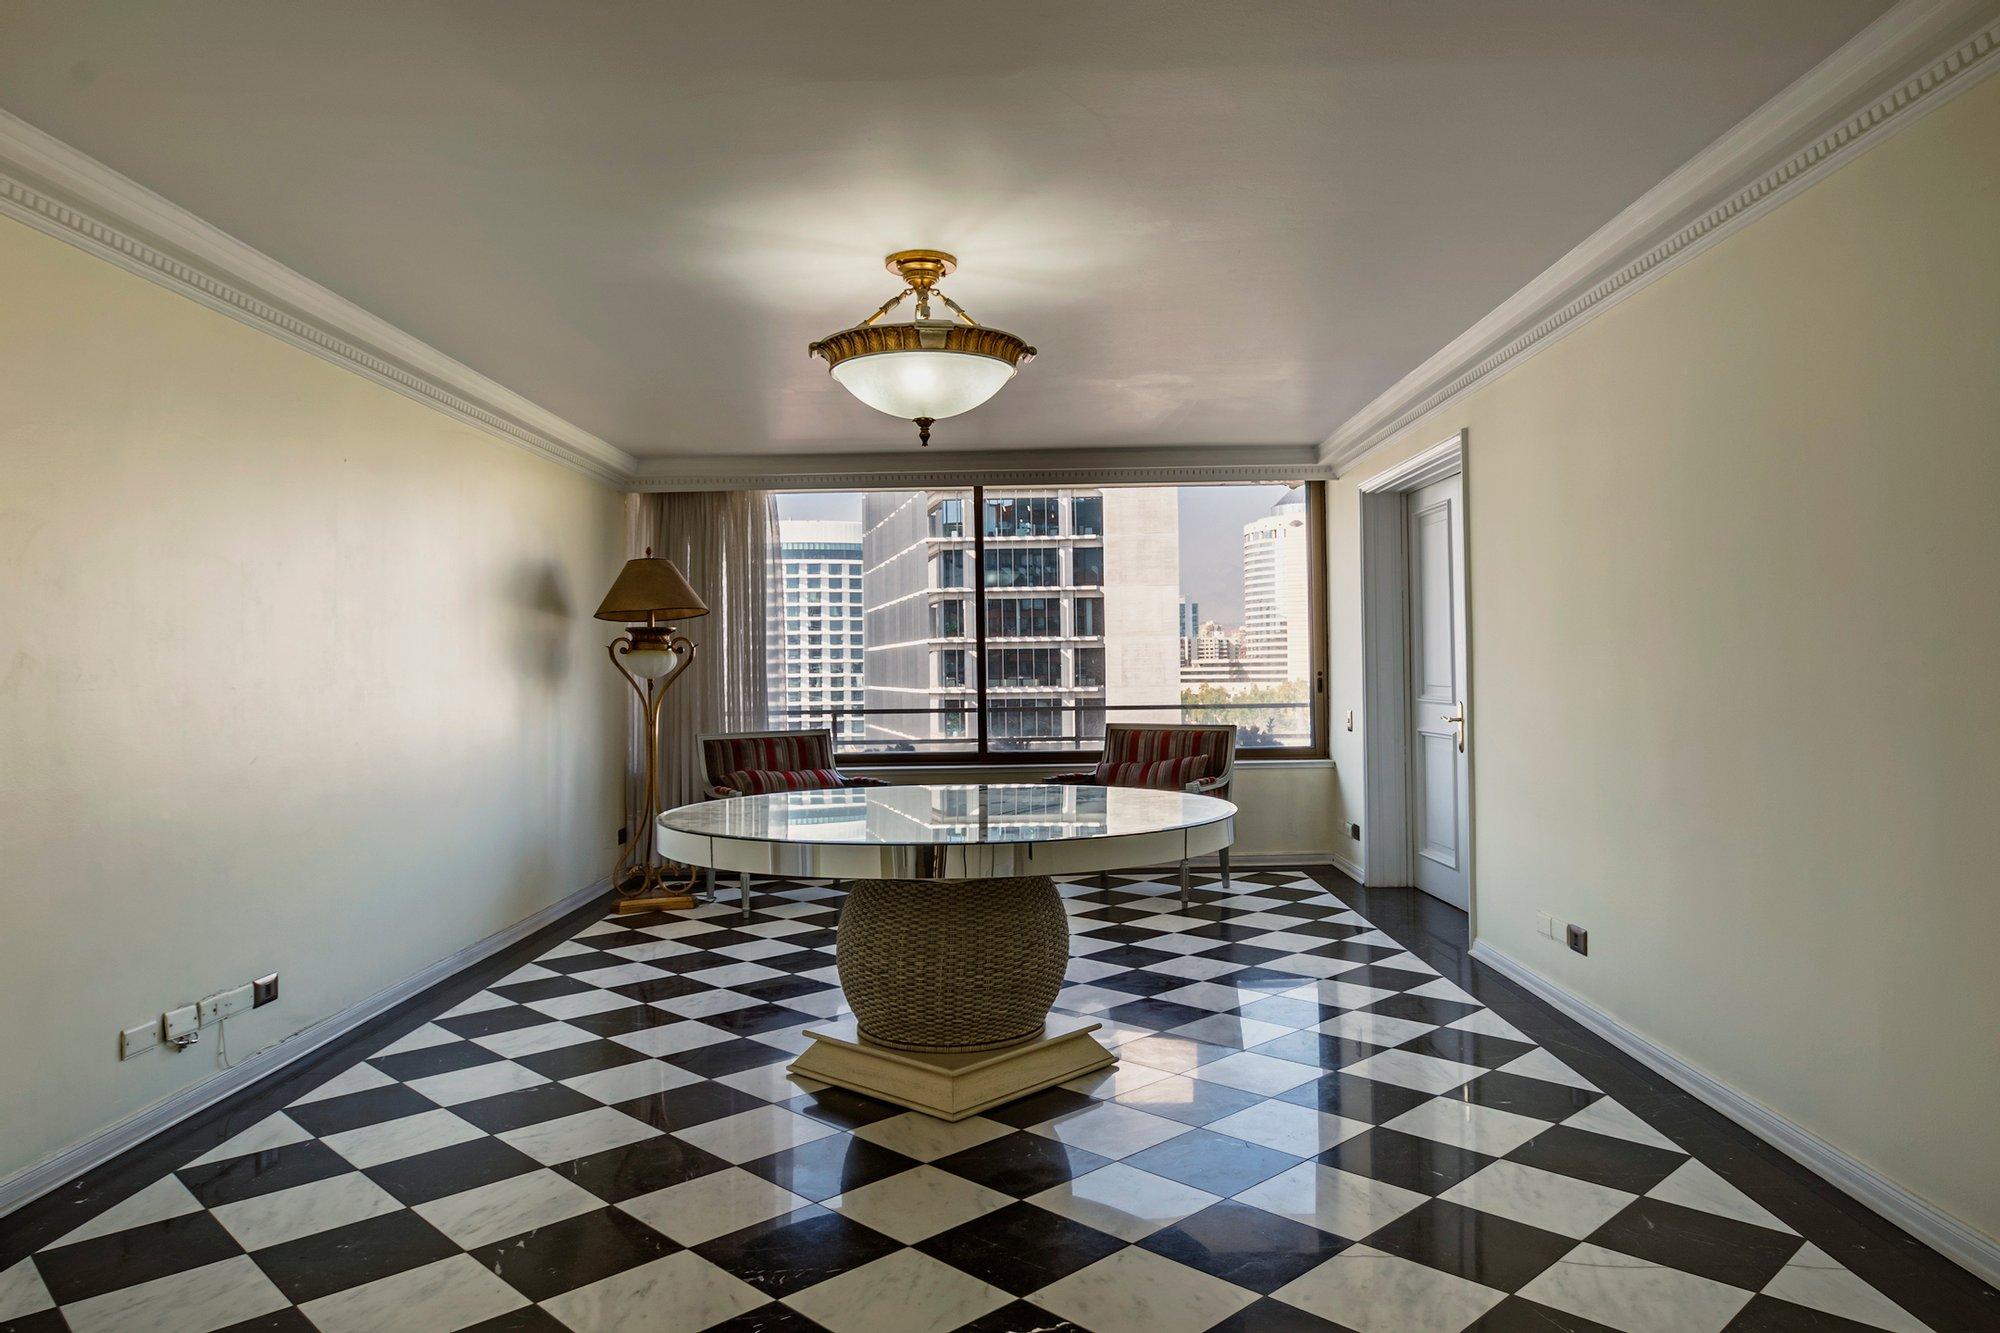 Appartamento a Santiago del Chile, Regione Metropolitana di Santiago, Cile 1 - 11420231